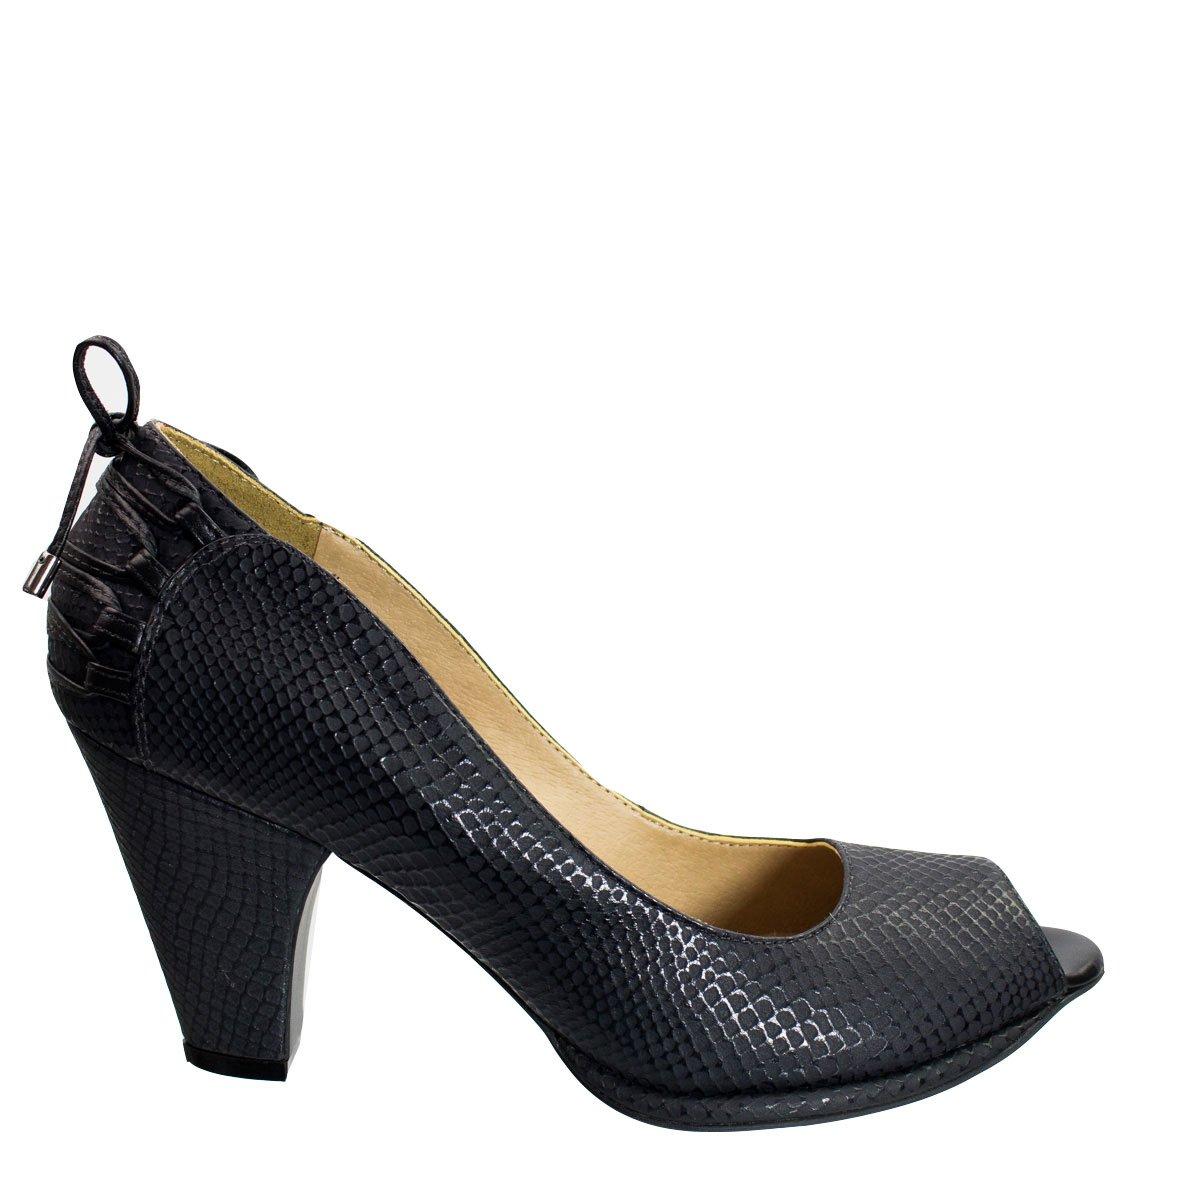 d74874b03f Bizz Store - Sapato Peep Toe Feminino Cristófoli Katty Couro